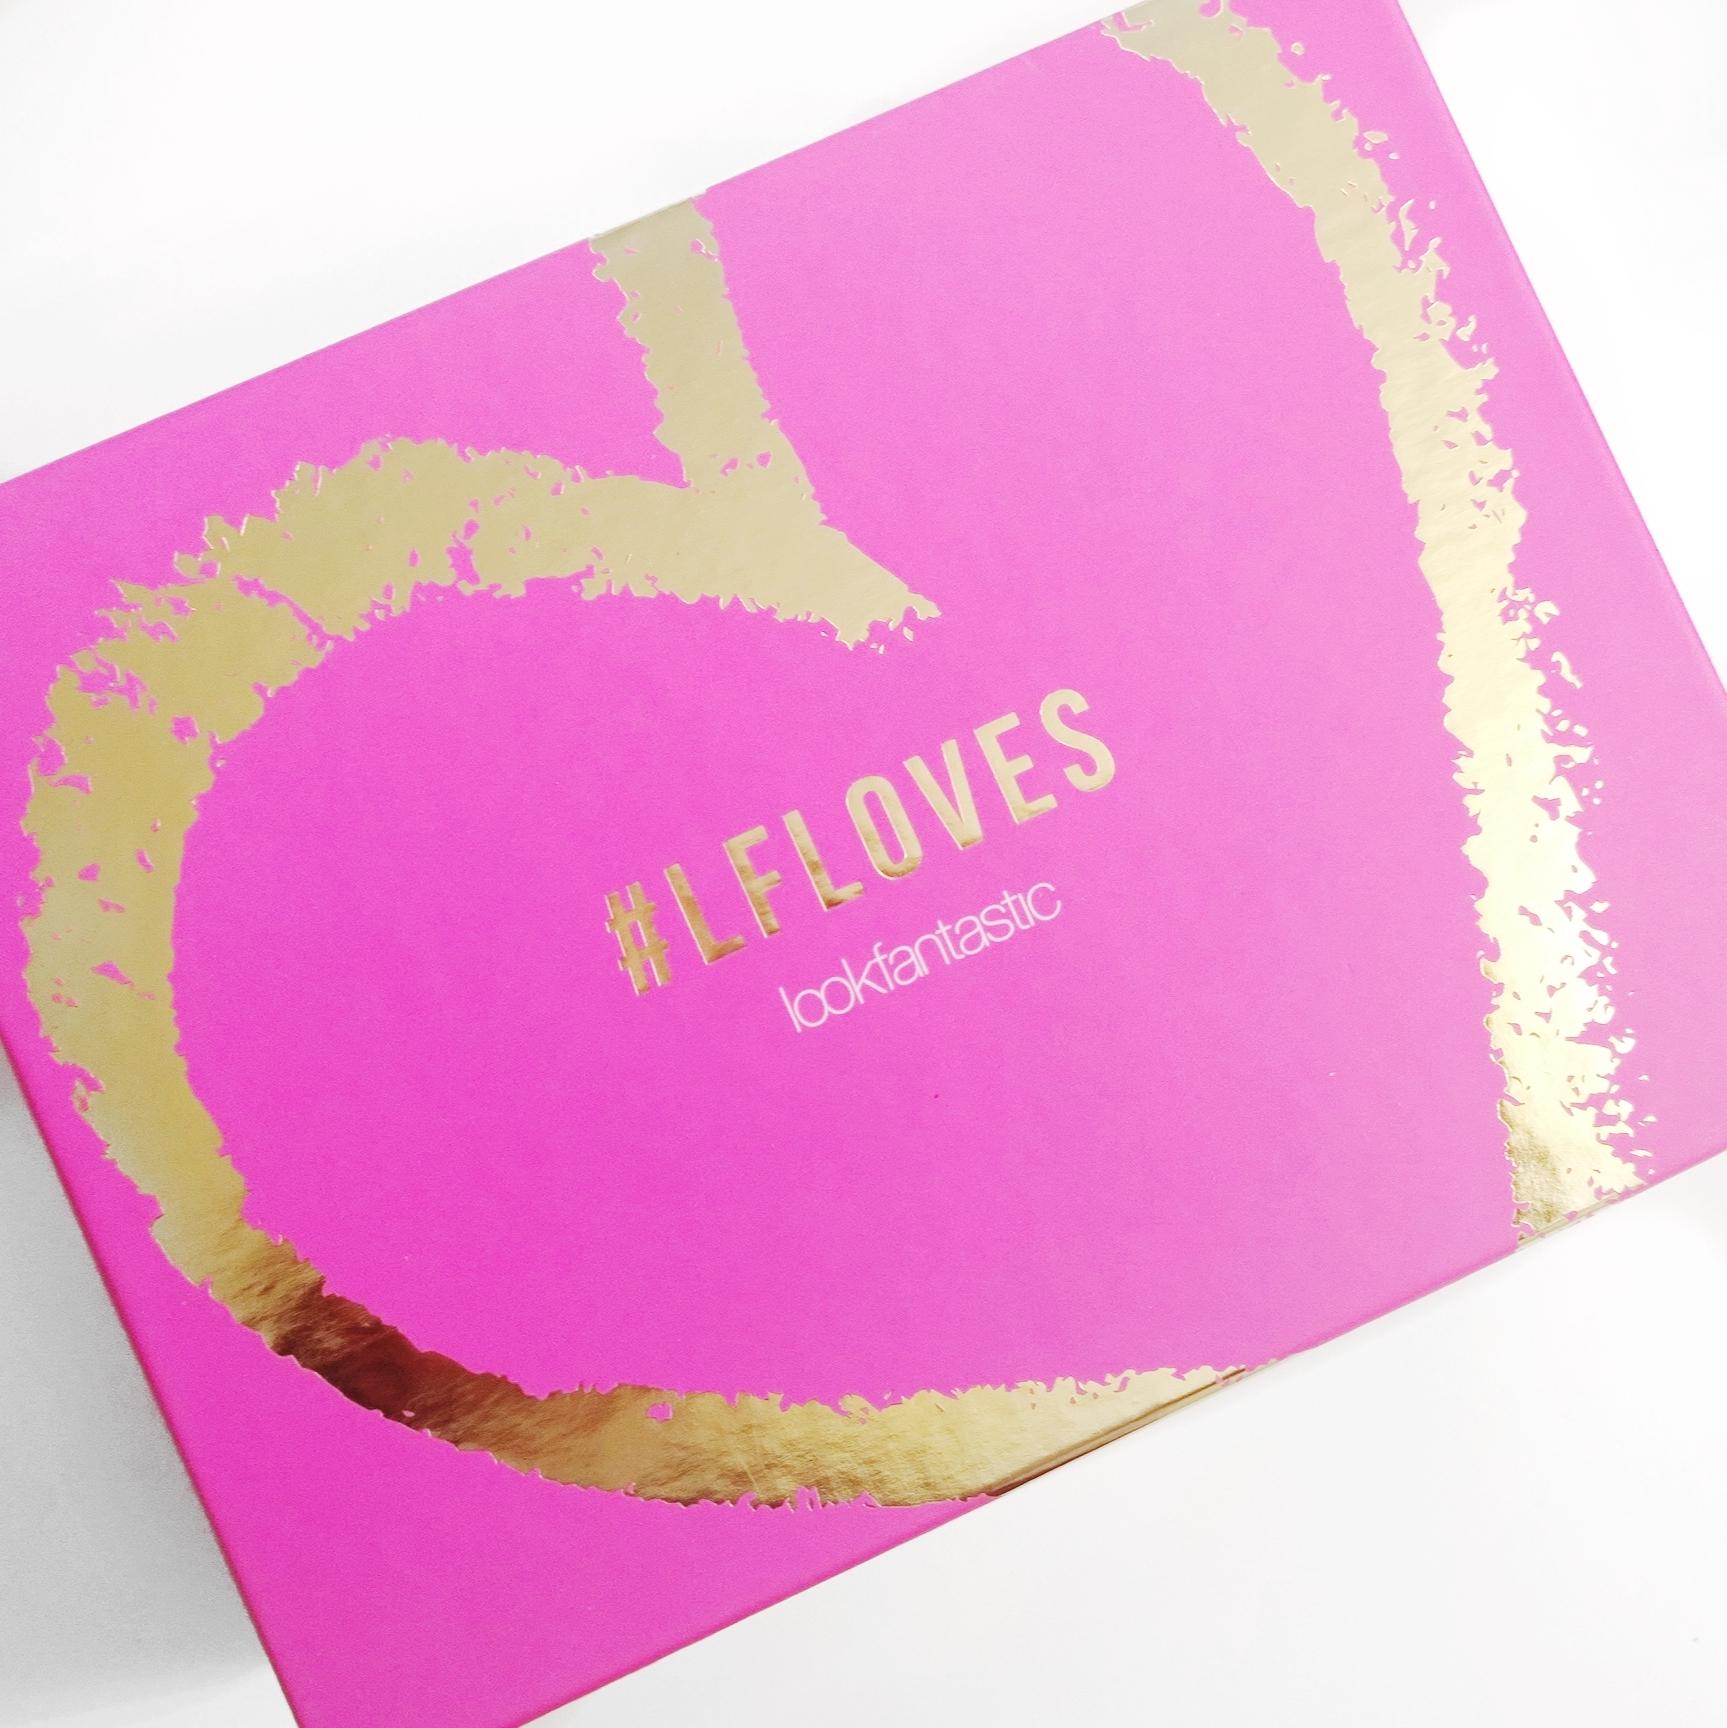 Lookfantastic Beauty Box Februar 2016 #lfloves